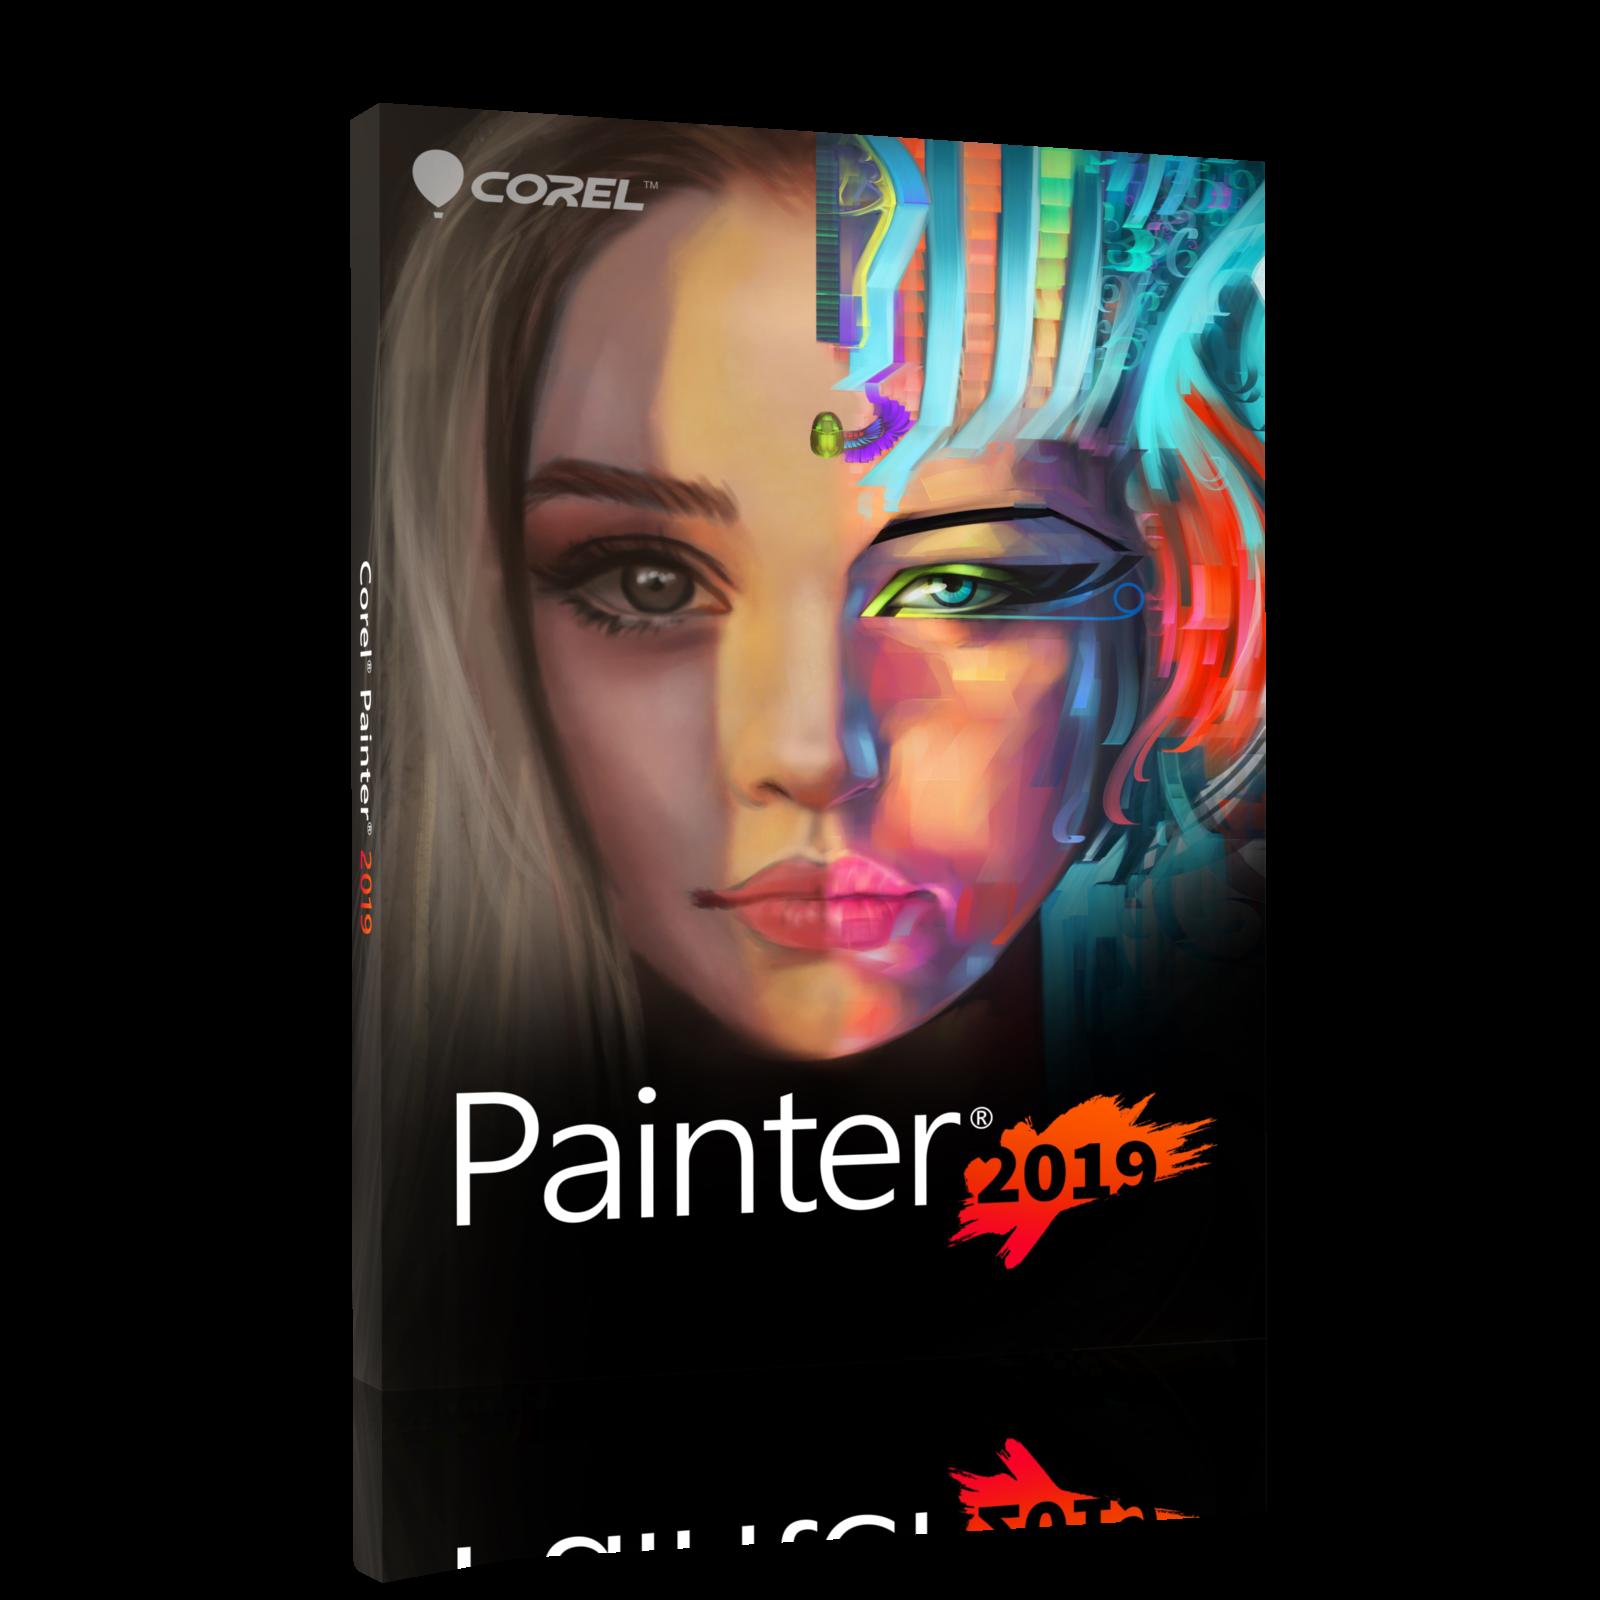 Painter2019